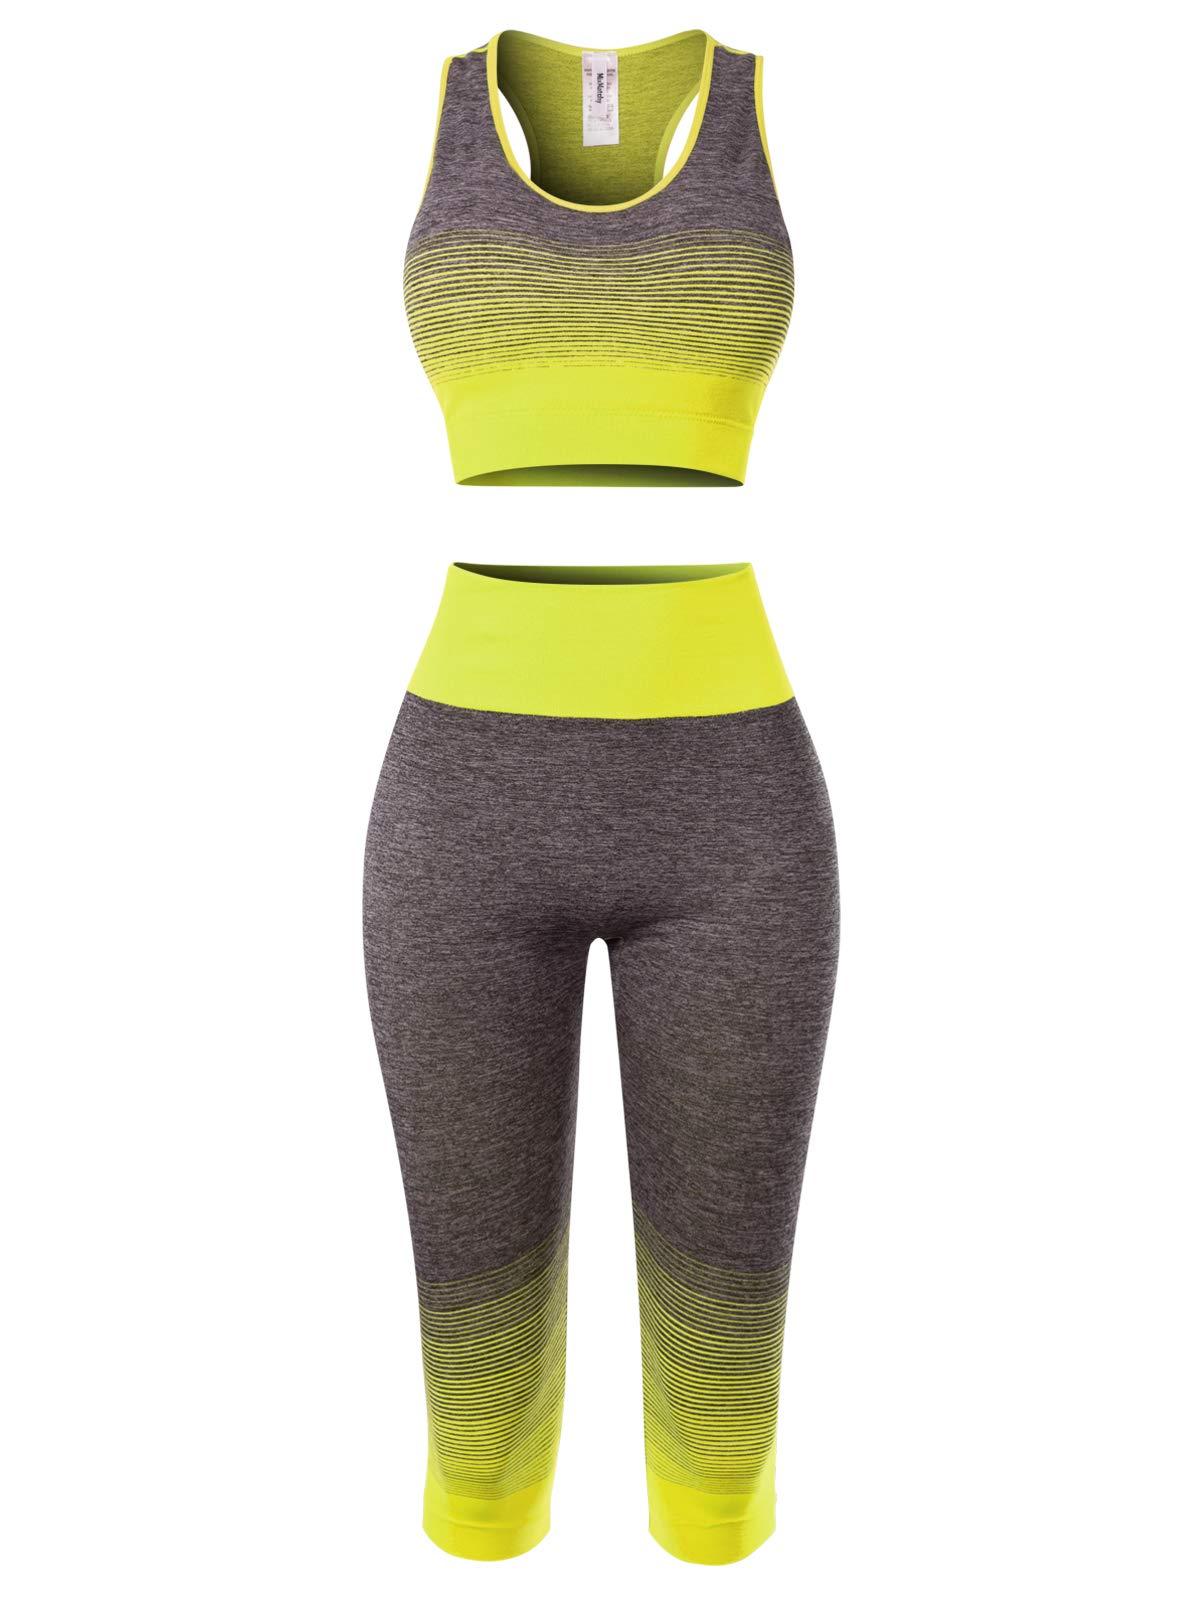 MixMatchy Women's Two-Piece Sports Bra + Capri Leggings Gym Yoga Wear Set Neon Yellow ONE by MixMatchy